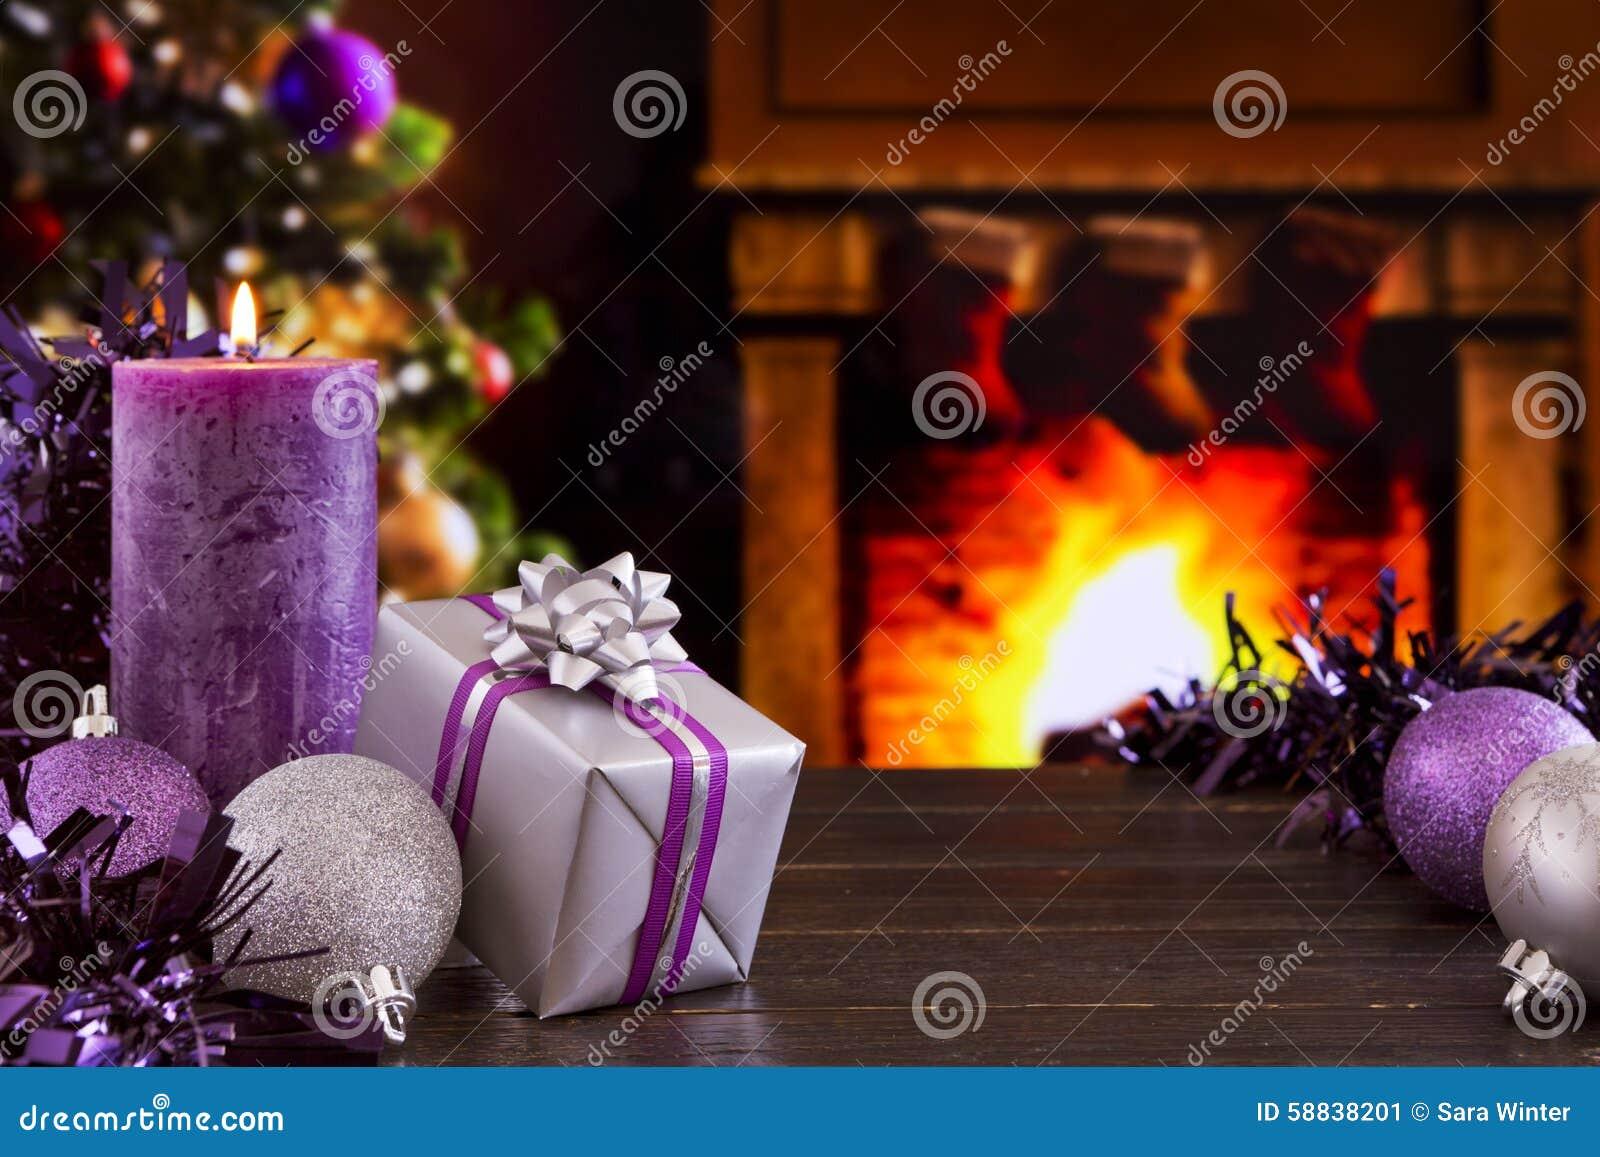 Christmas Scene With Fireplace And Christmas Tree Stock